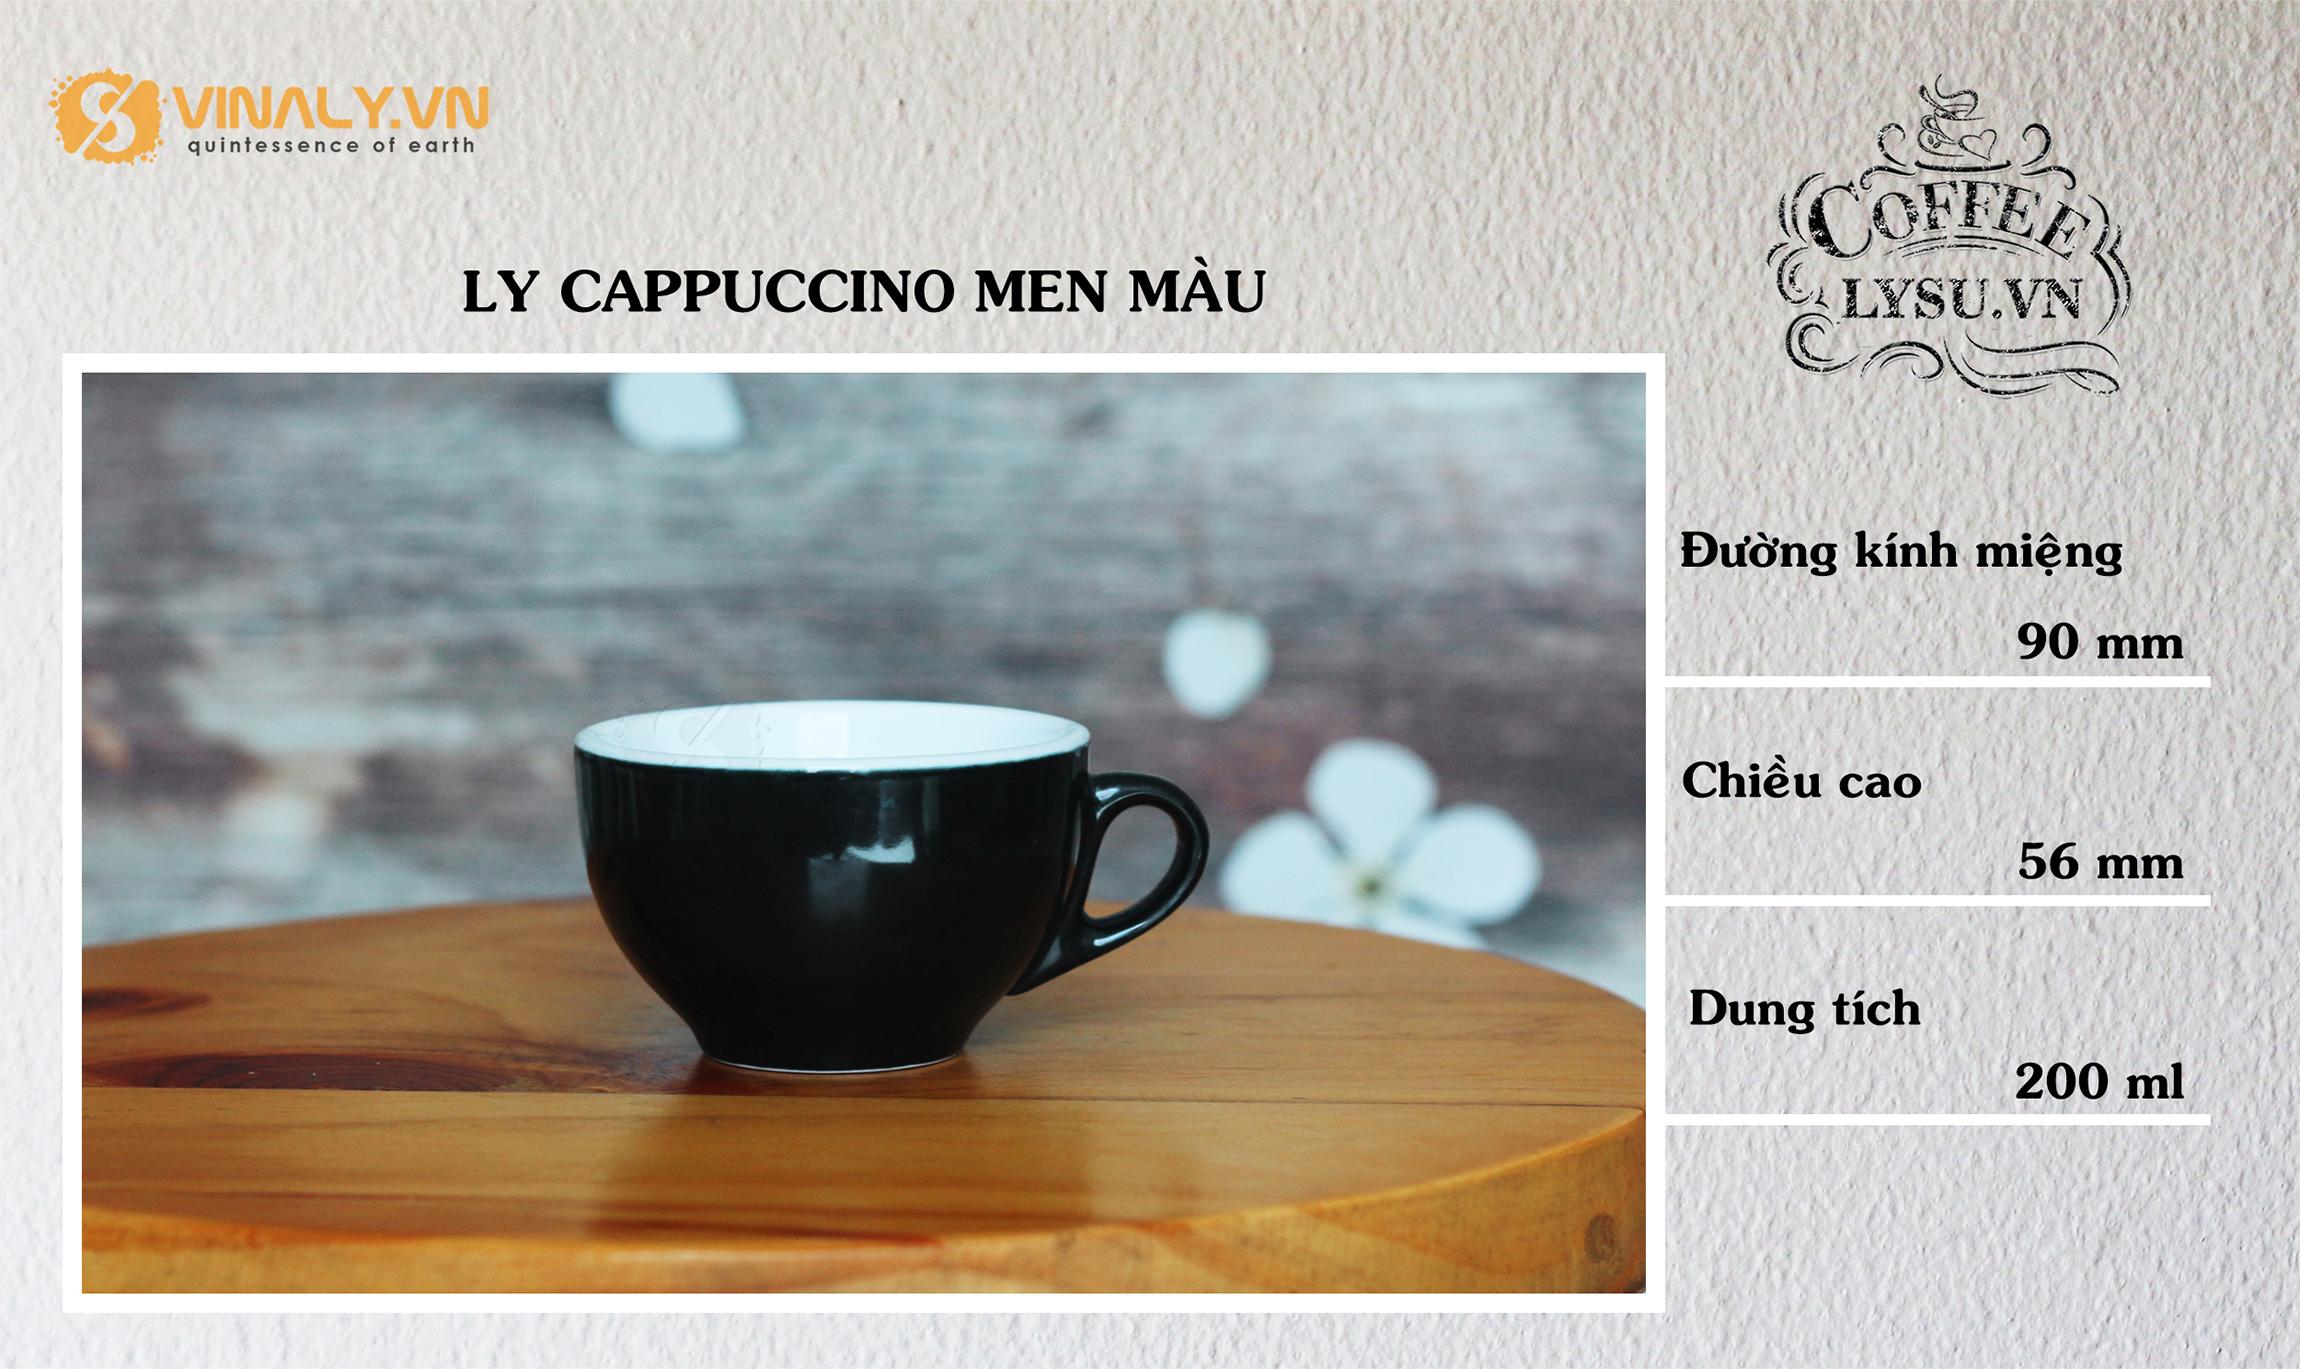 ly-su-vinaly-ly-su-quan-cafe-ly-cappuccino-ly-su-cappuccino-men-mau-